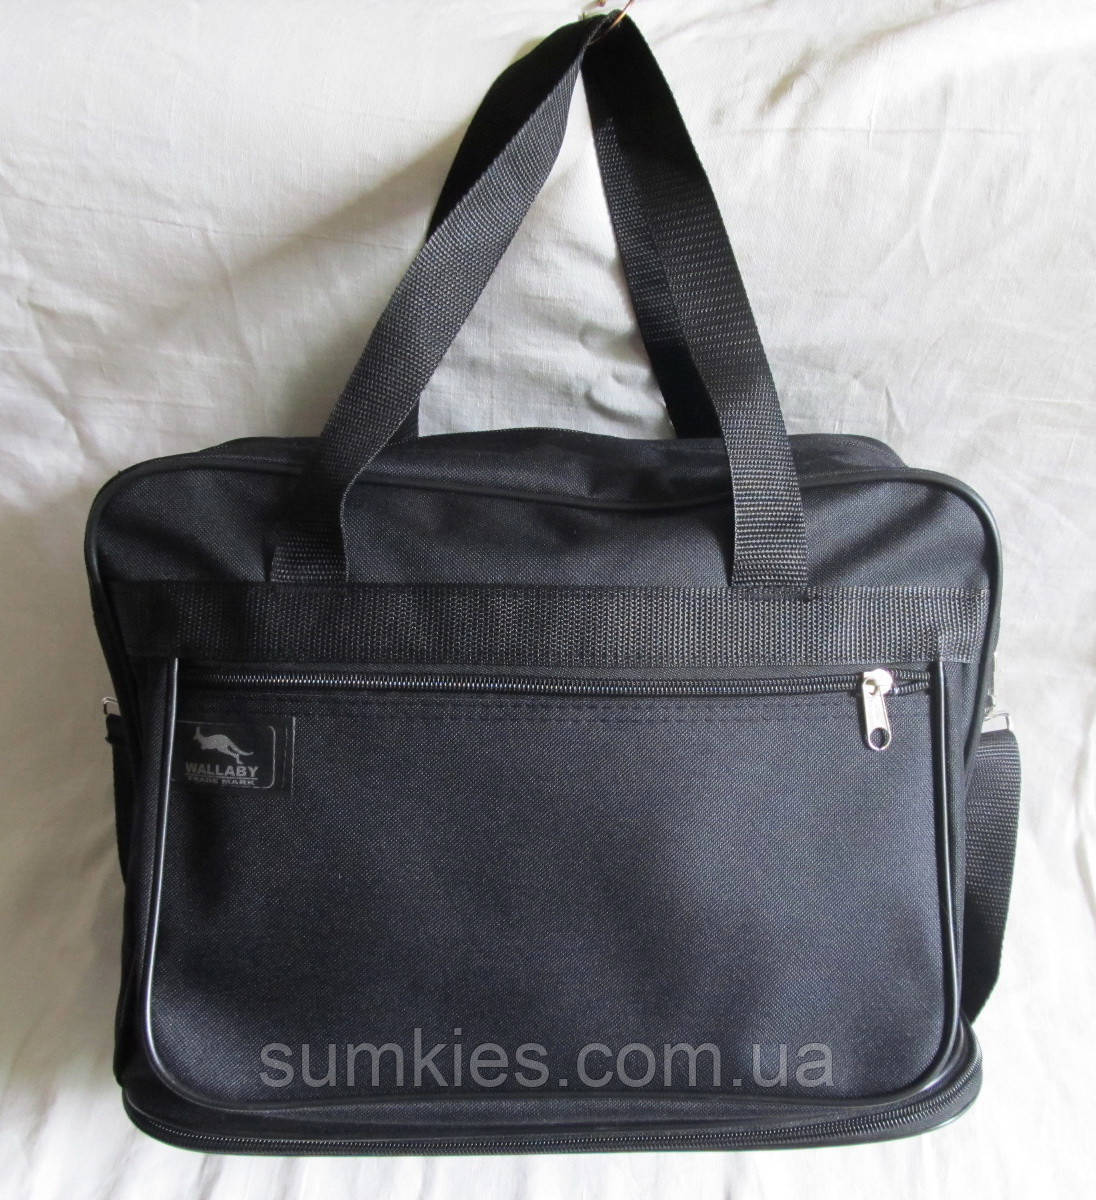 4e05ff1b8a06 Мужская сумка Wallaby 2071 черная барсетка через плечо А4 с расширением  32х26+12х19см